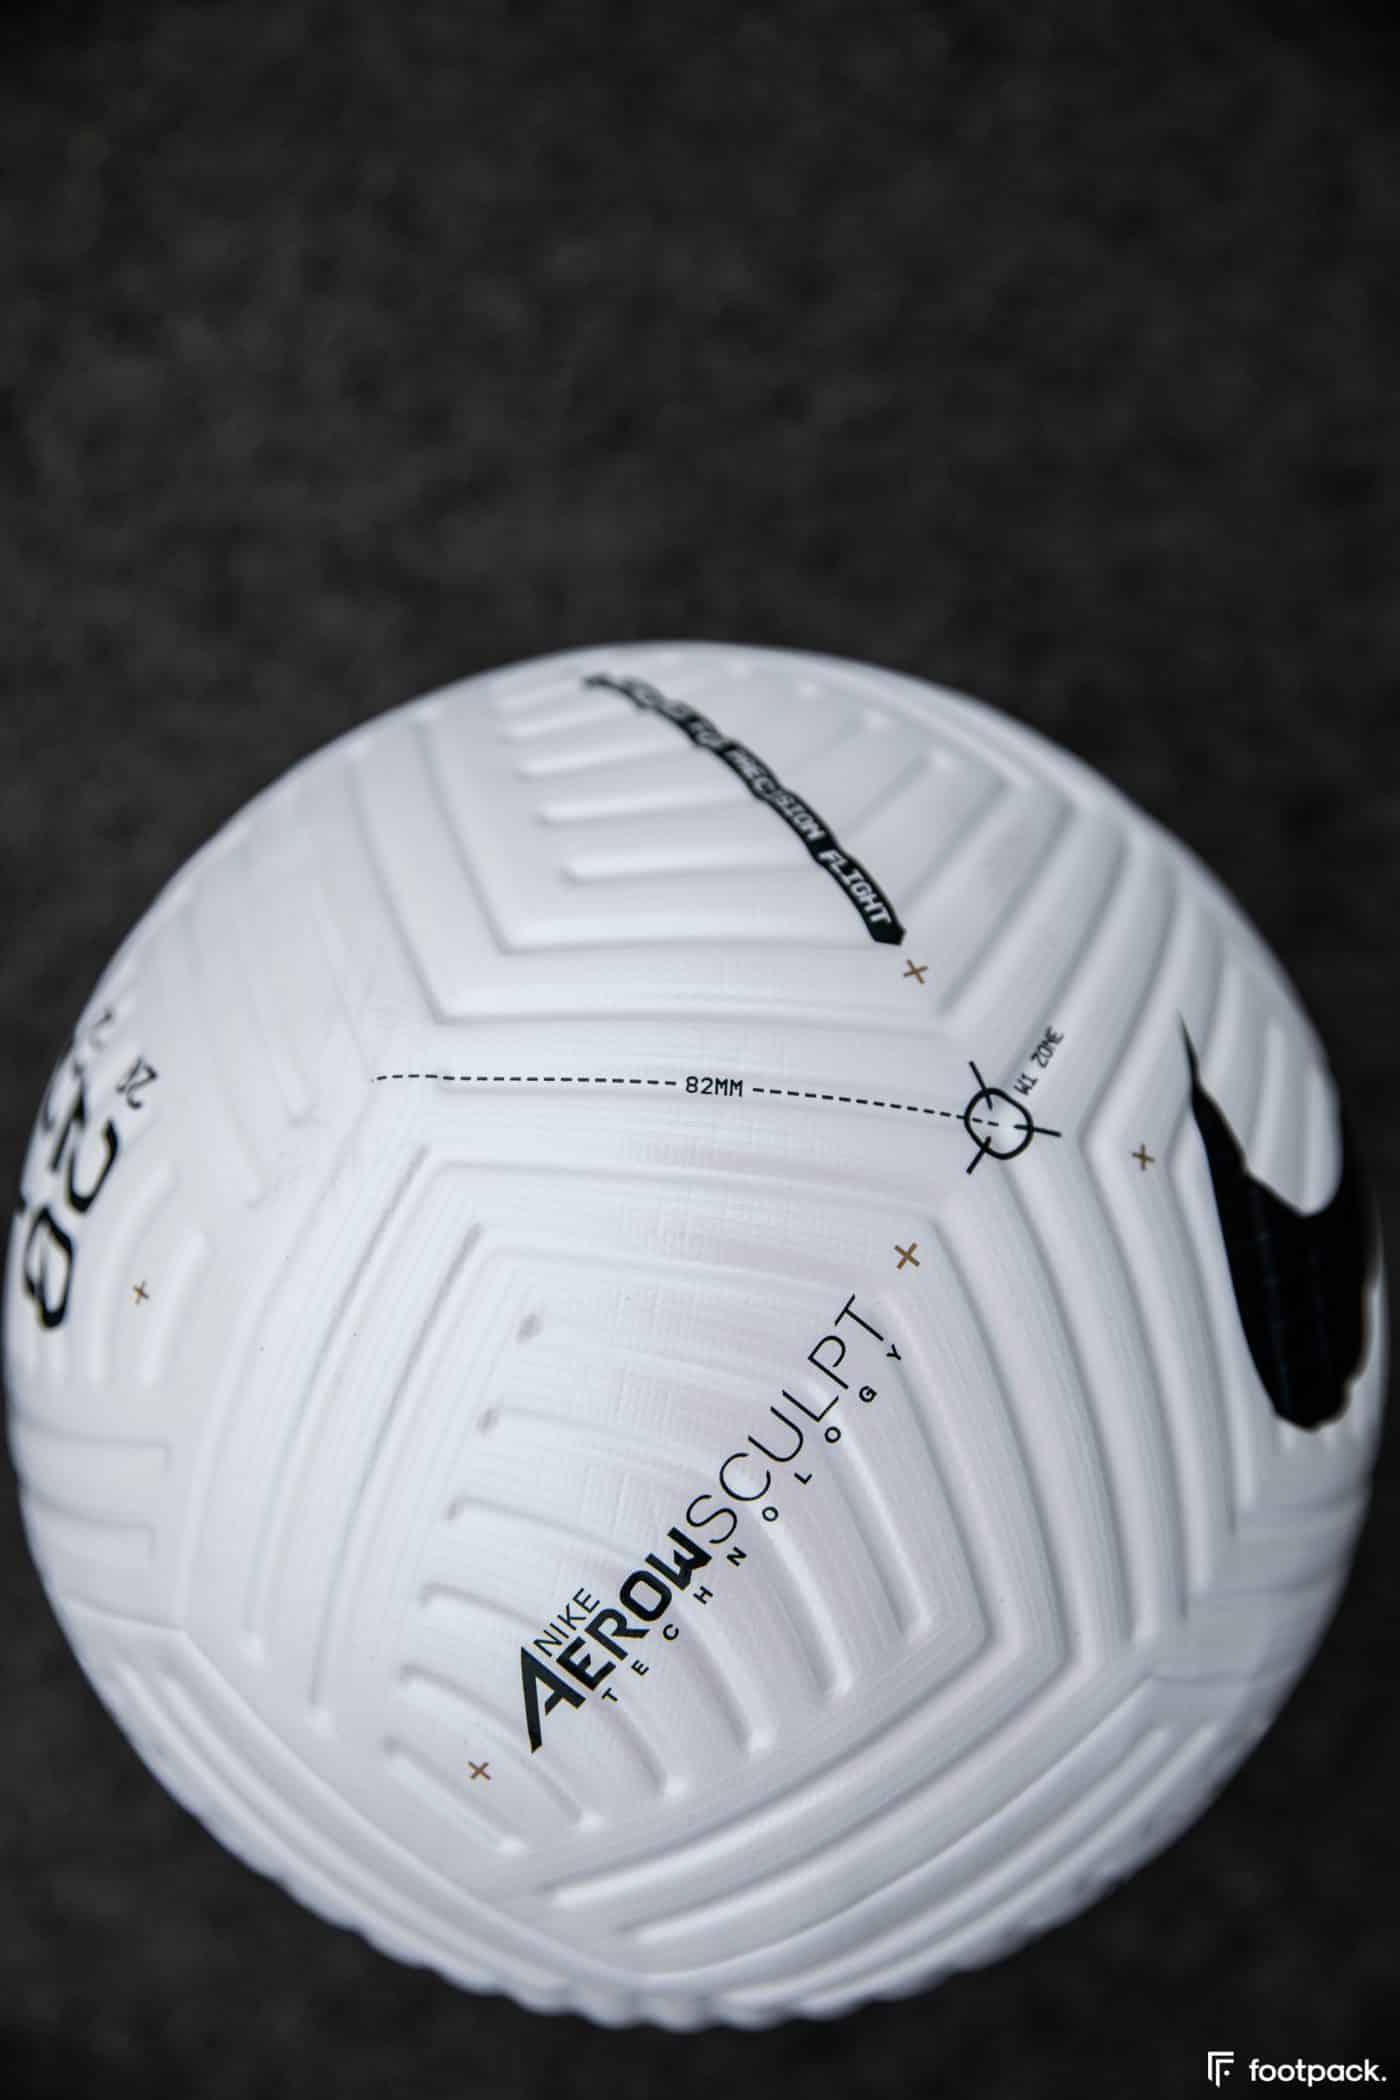 ballon-nike-flight-premier-league-serie-a-footpack-17